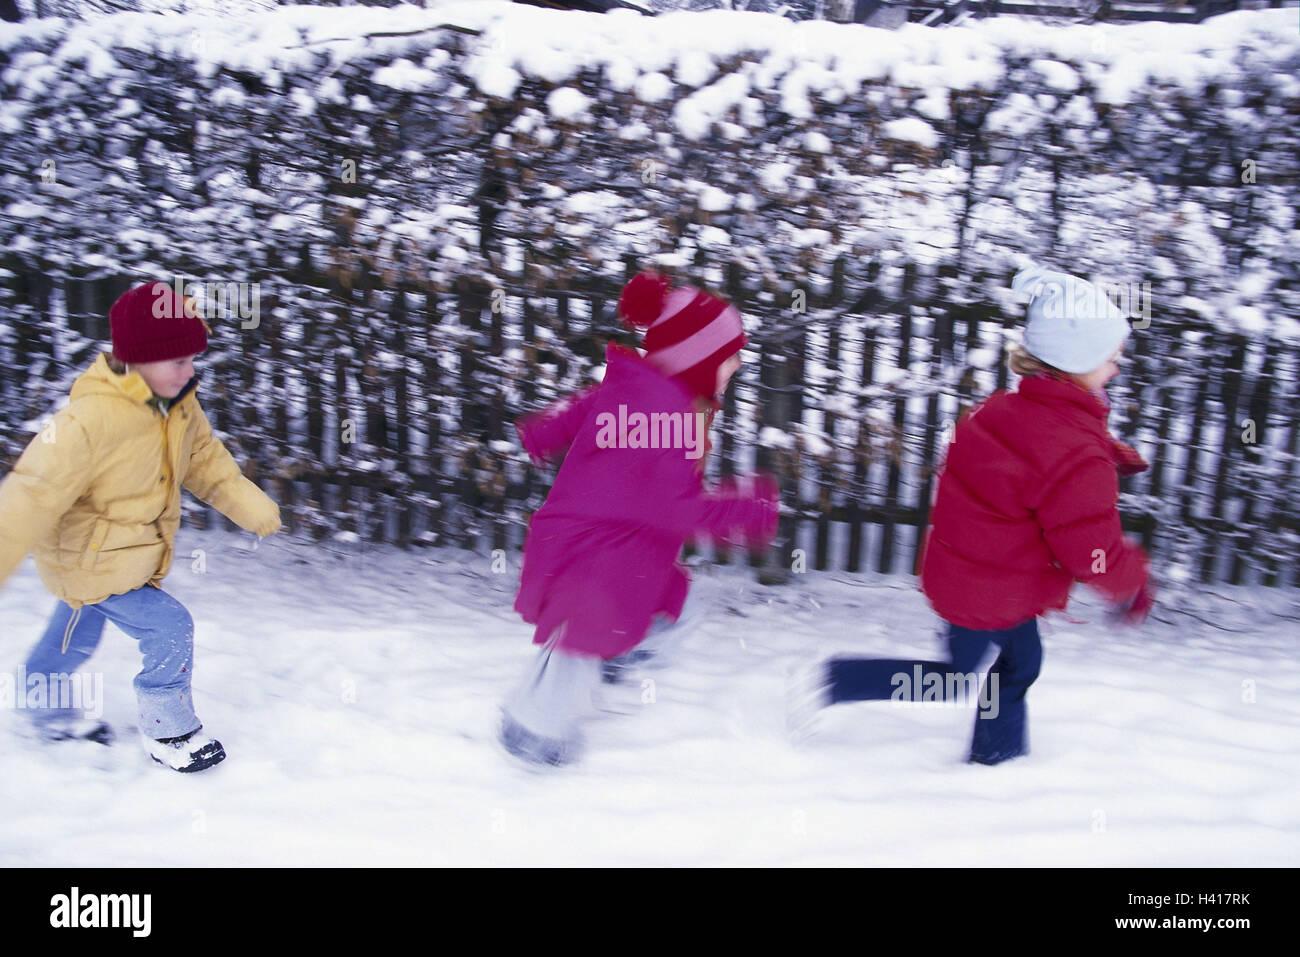 girls winter clothes snow run side view garden fence blur